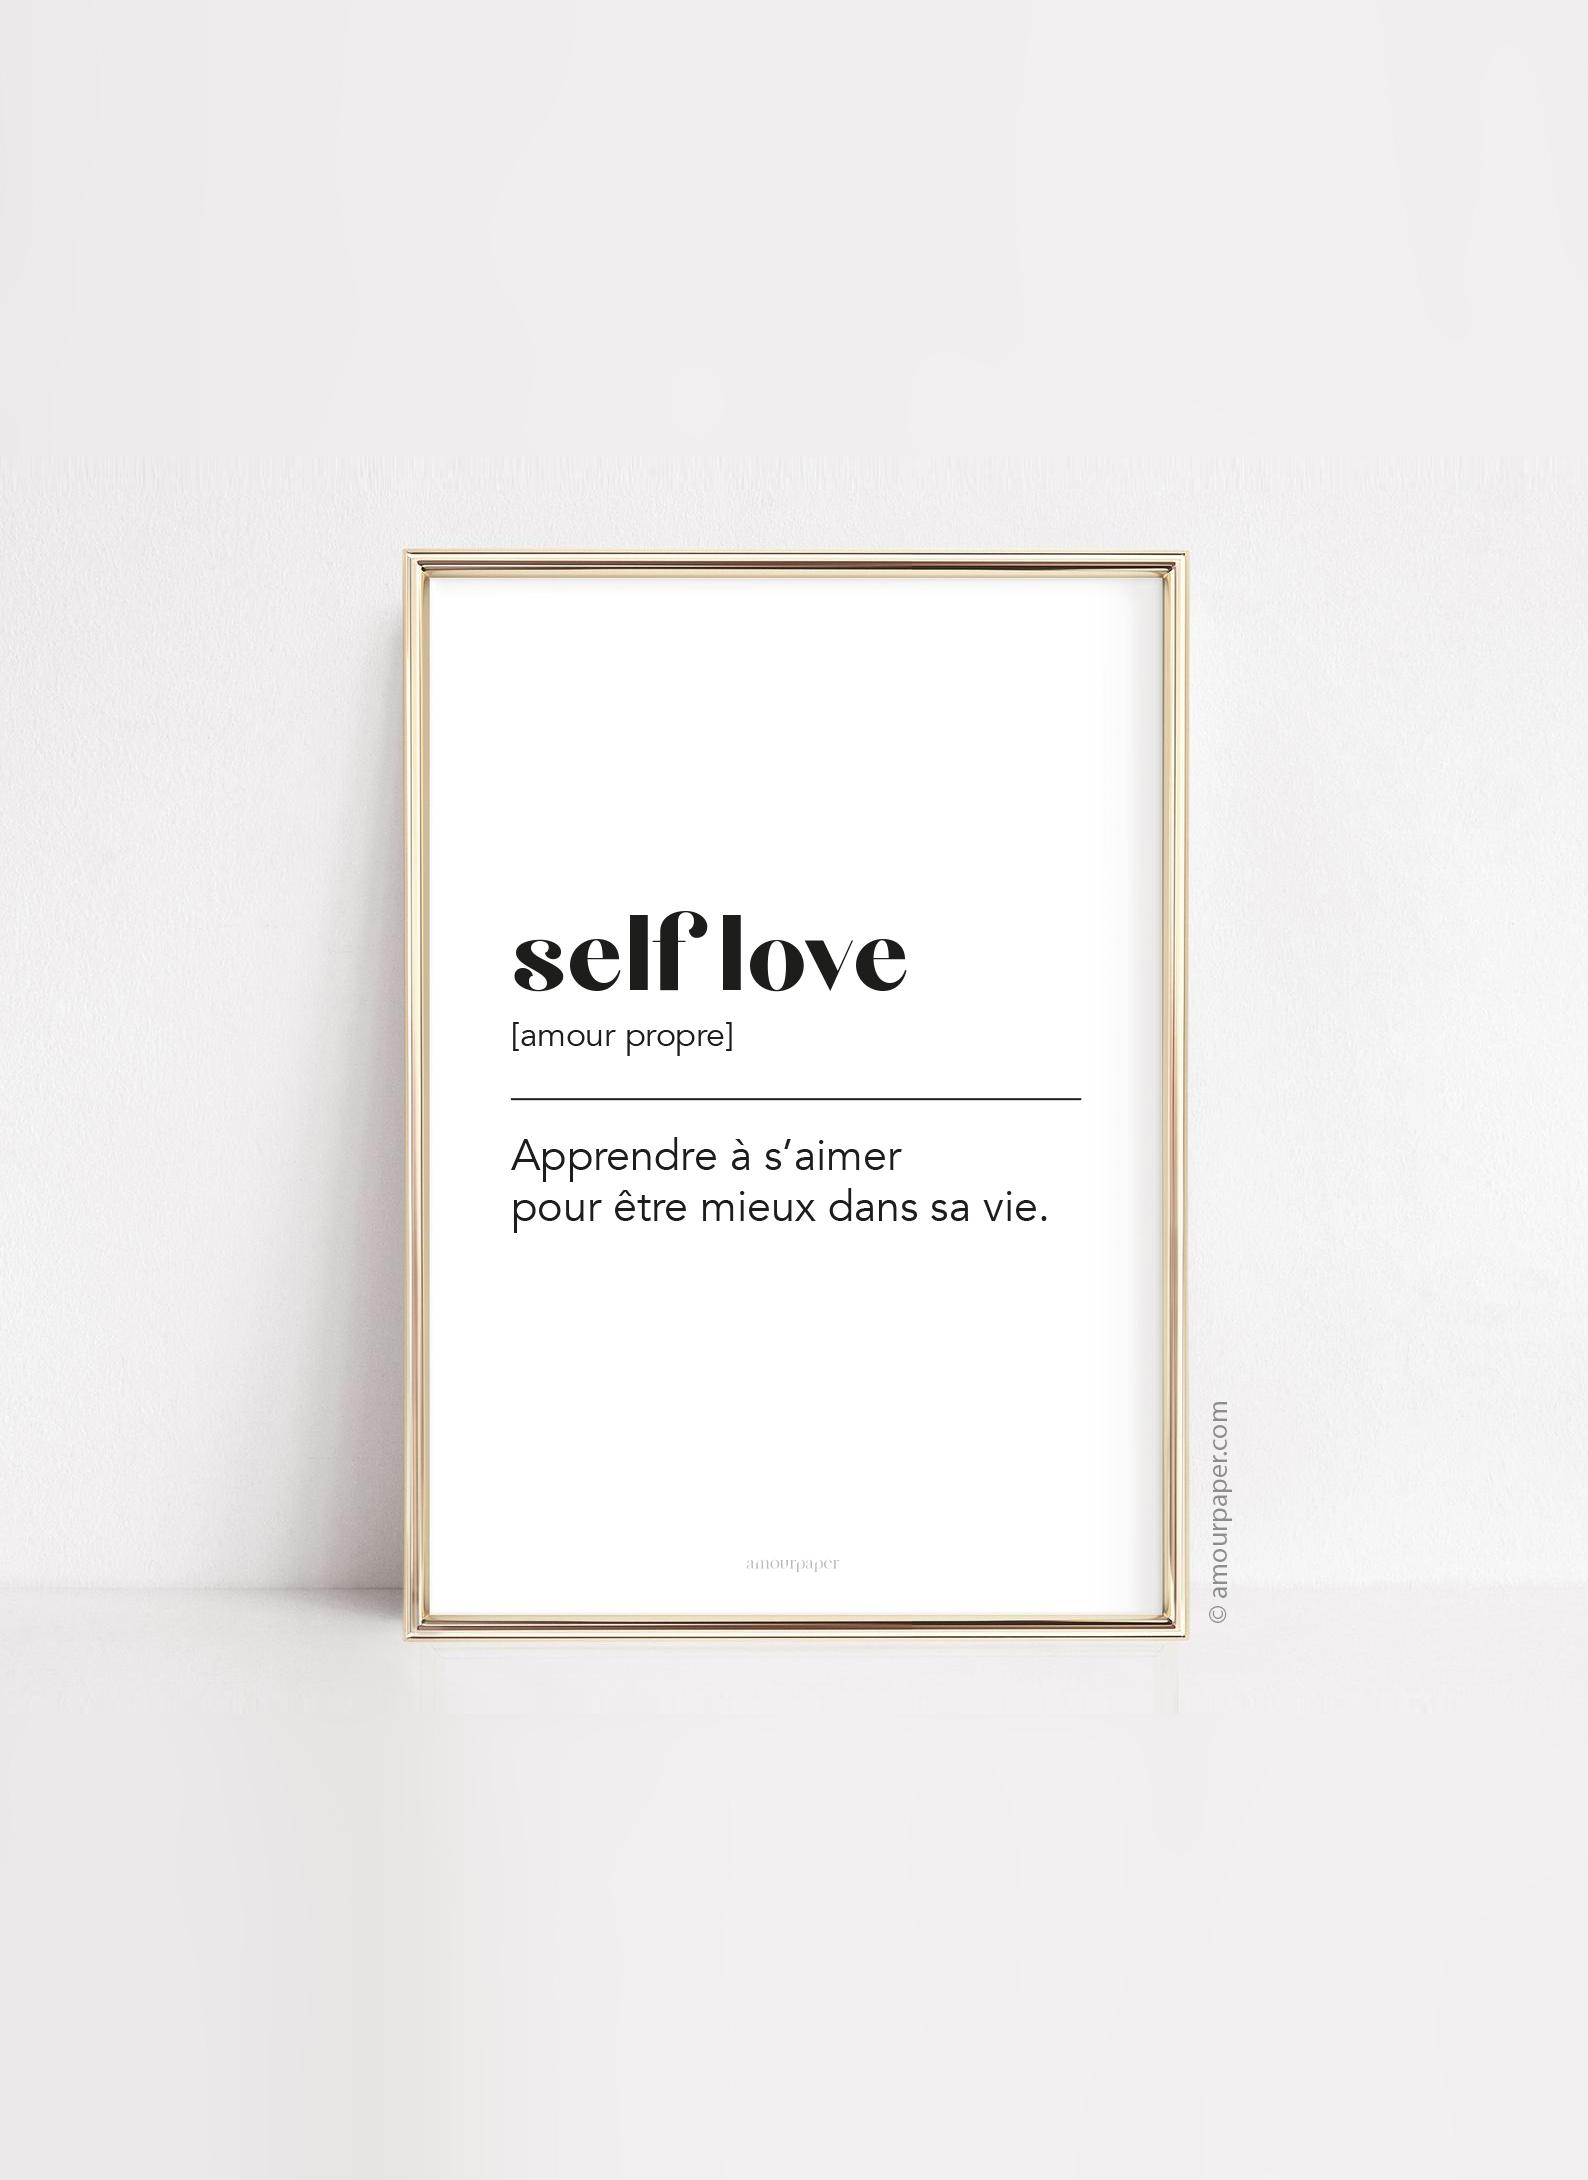 affiche self love